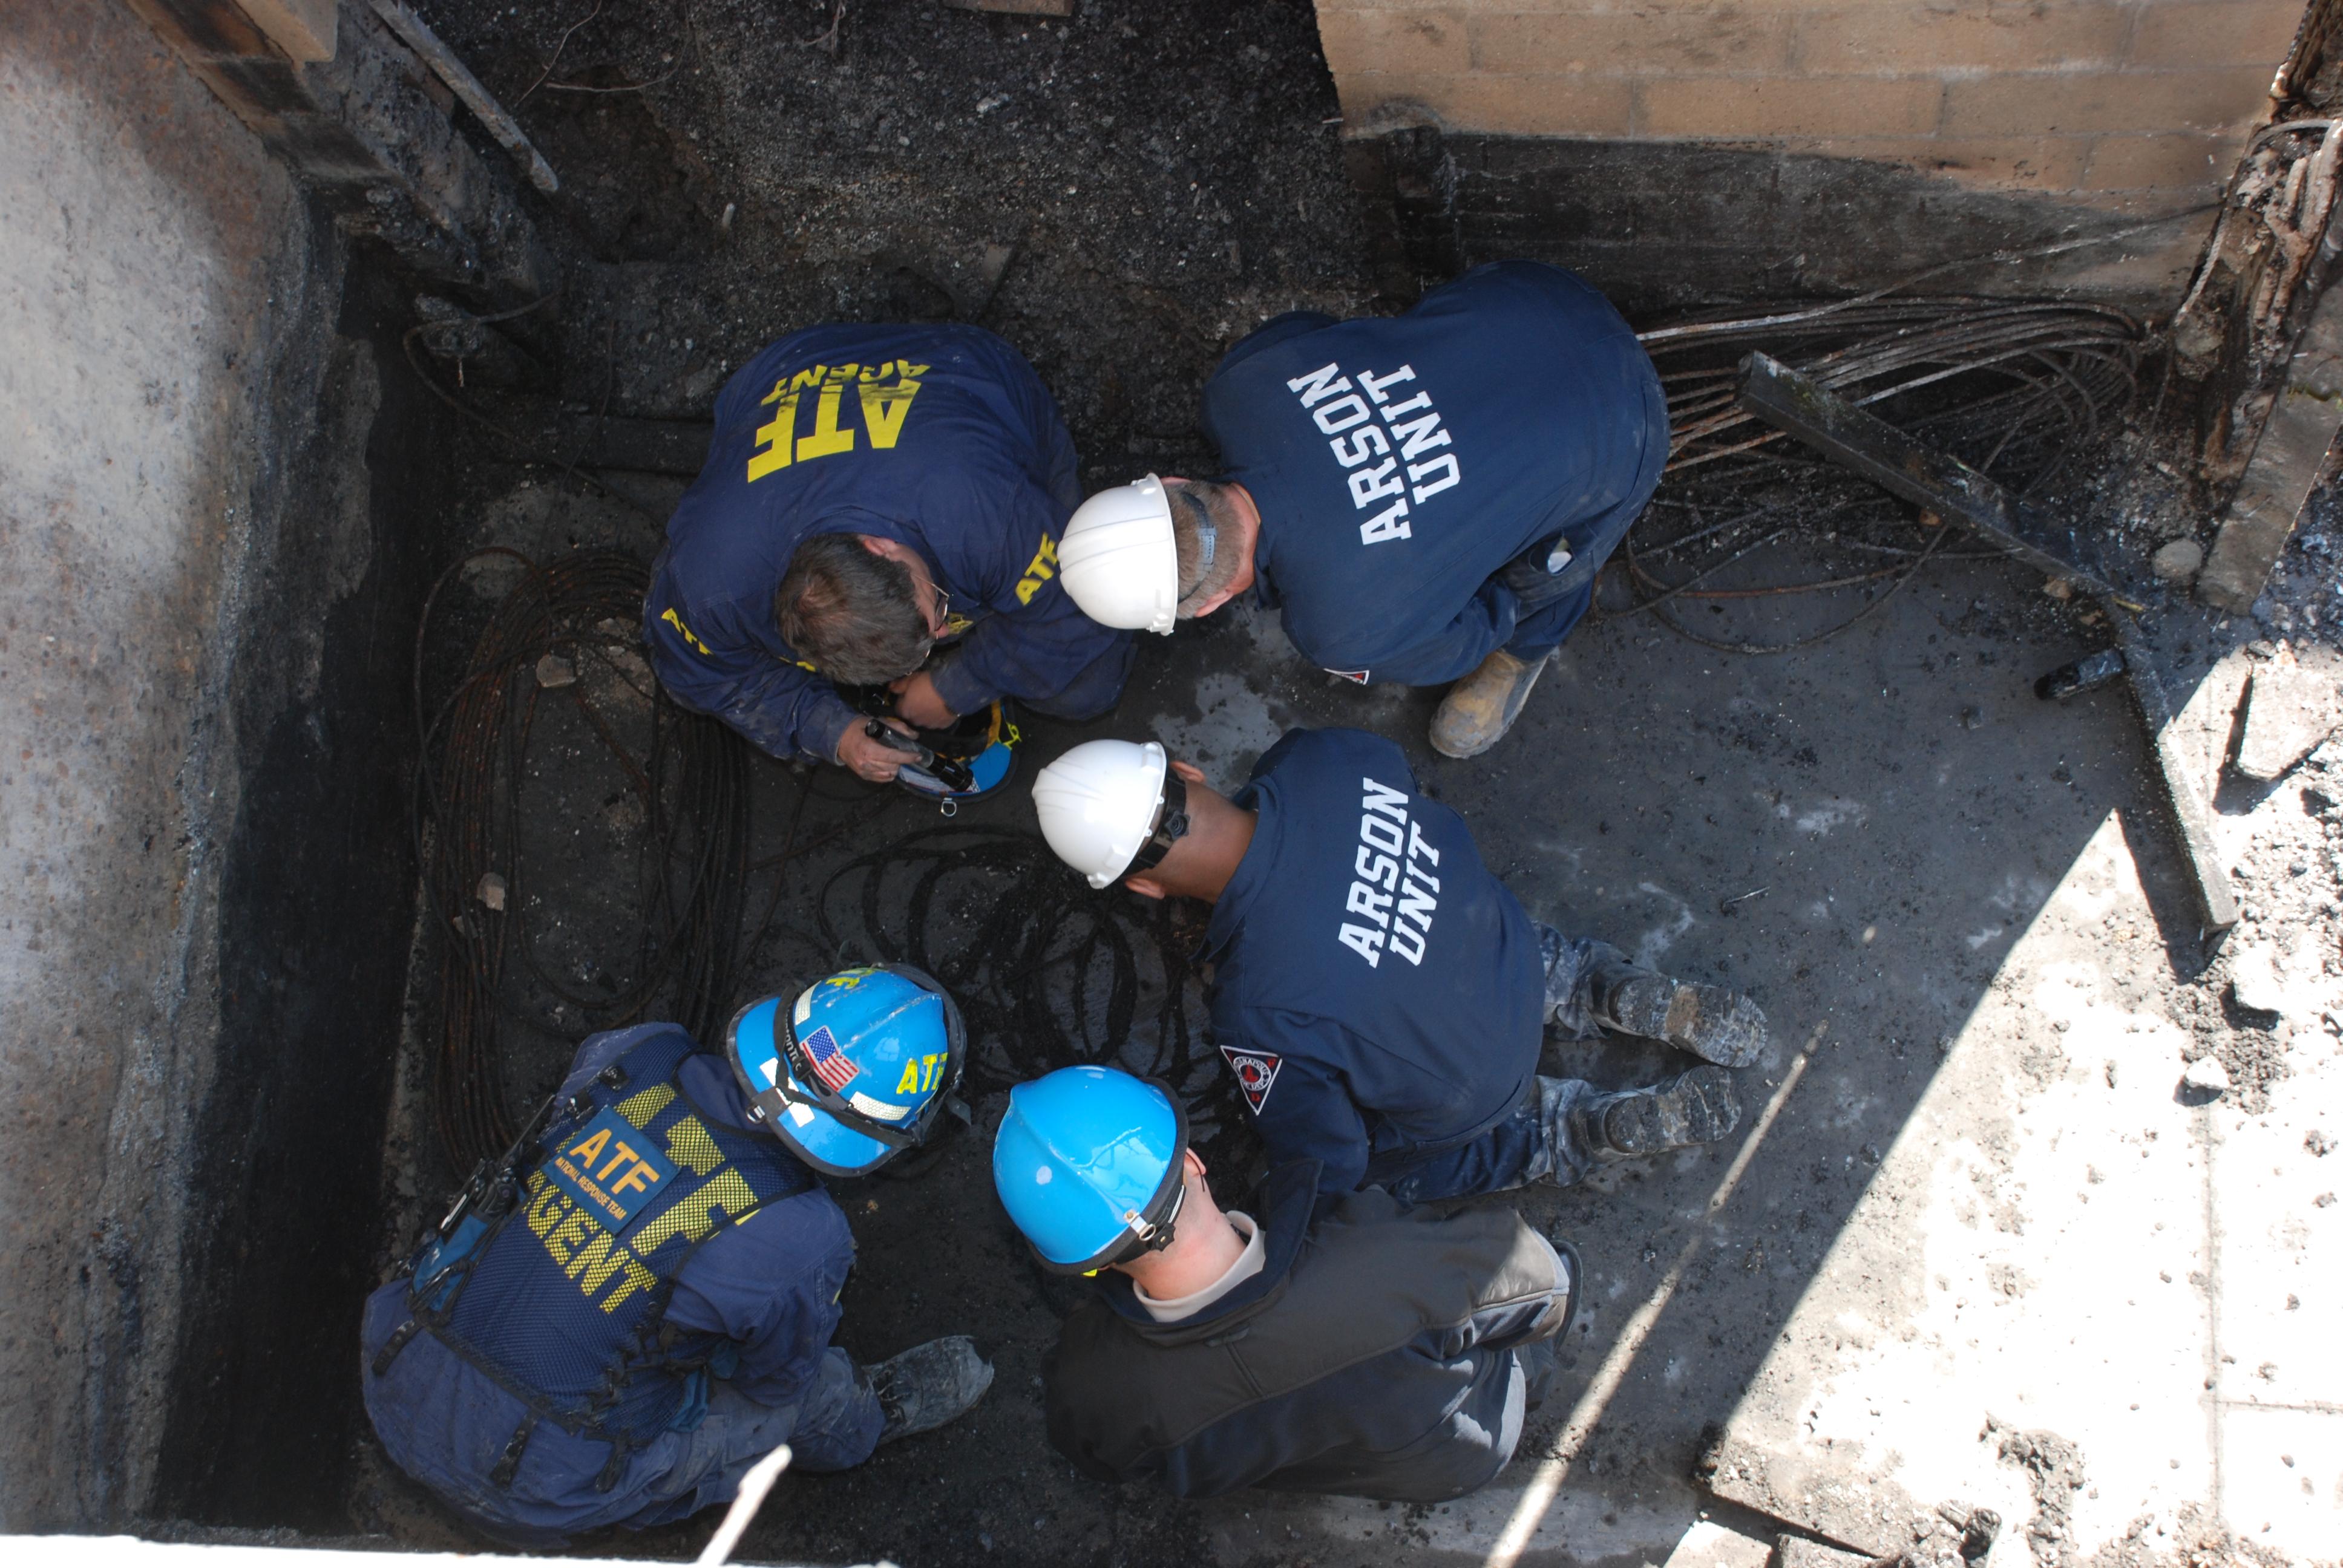 ATF National Response Teams help support a criminal investigation